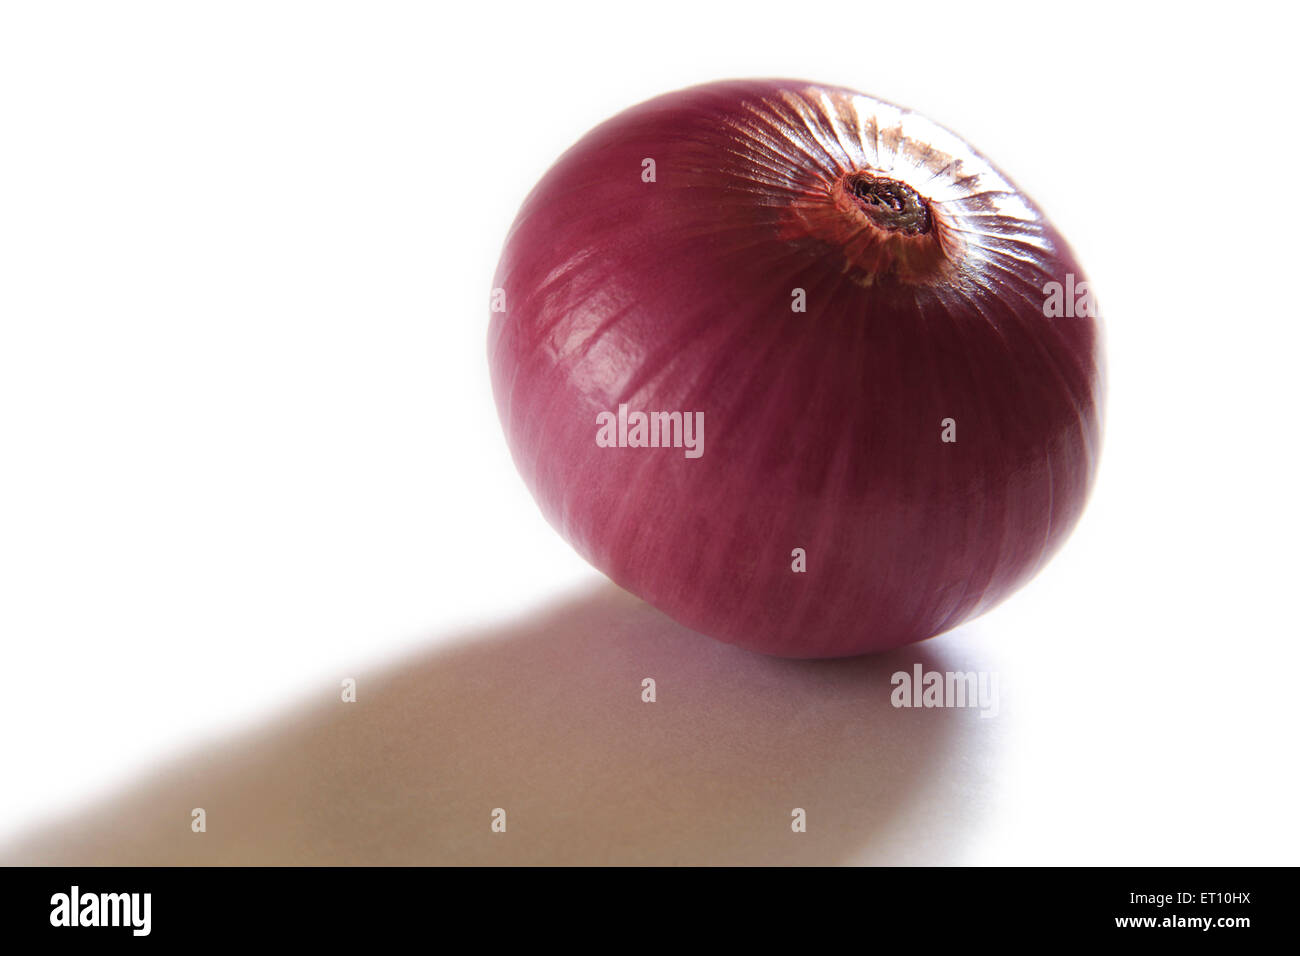 Spices ; kanda piyaz unpeel onion allium cepa on white background - Stock Image